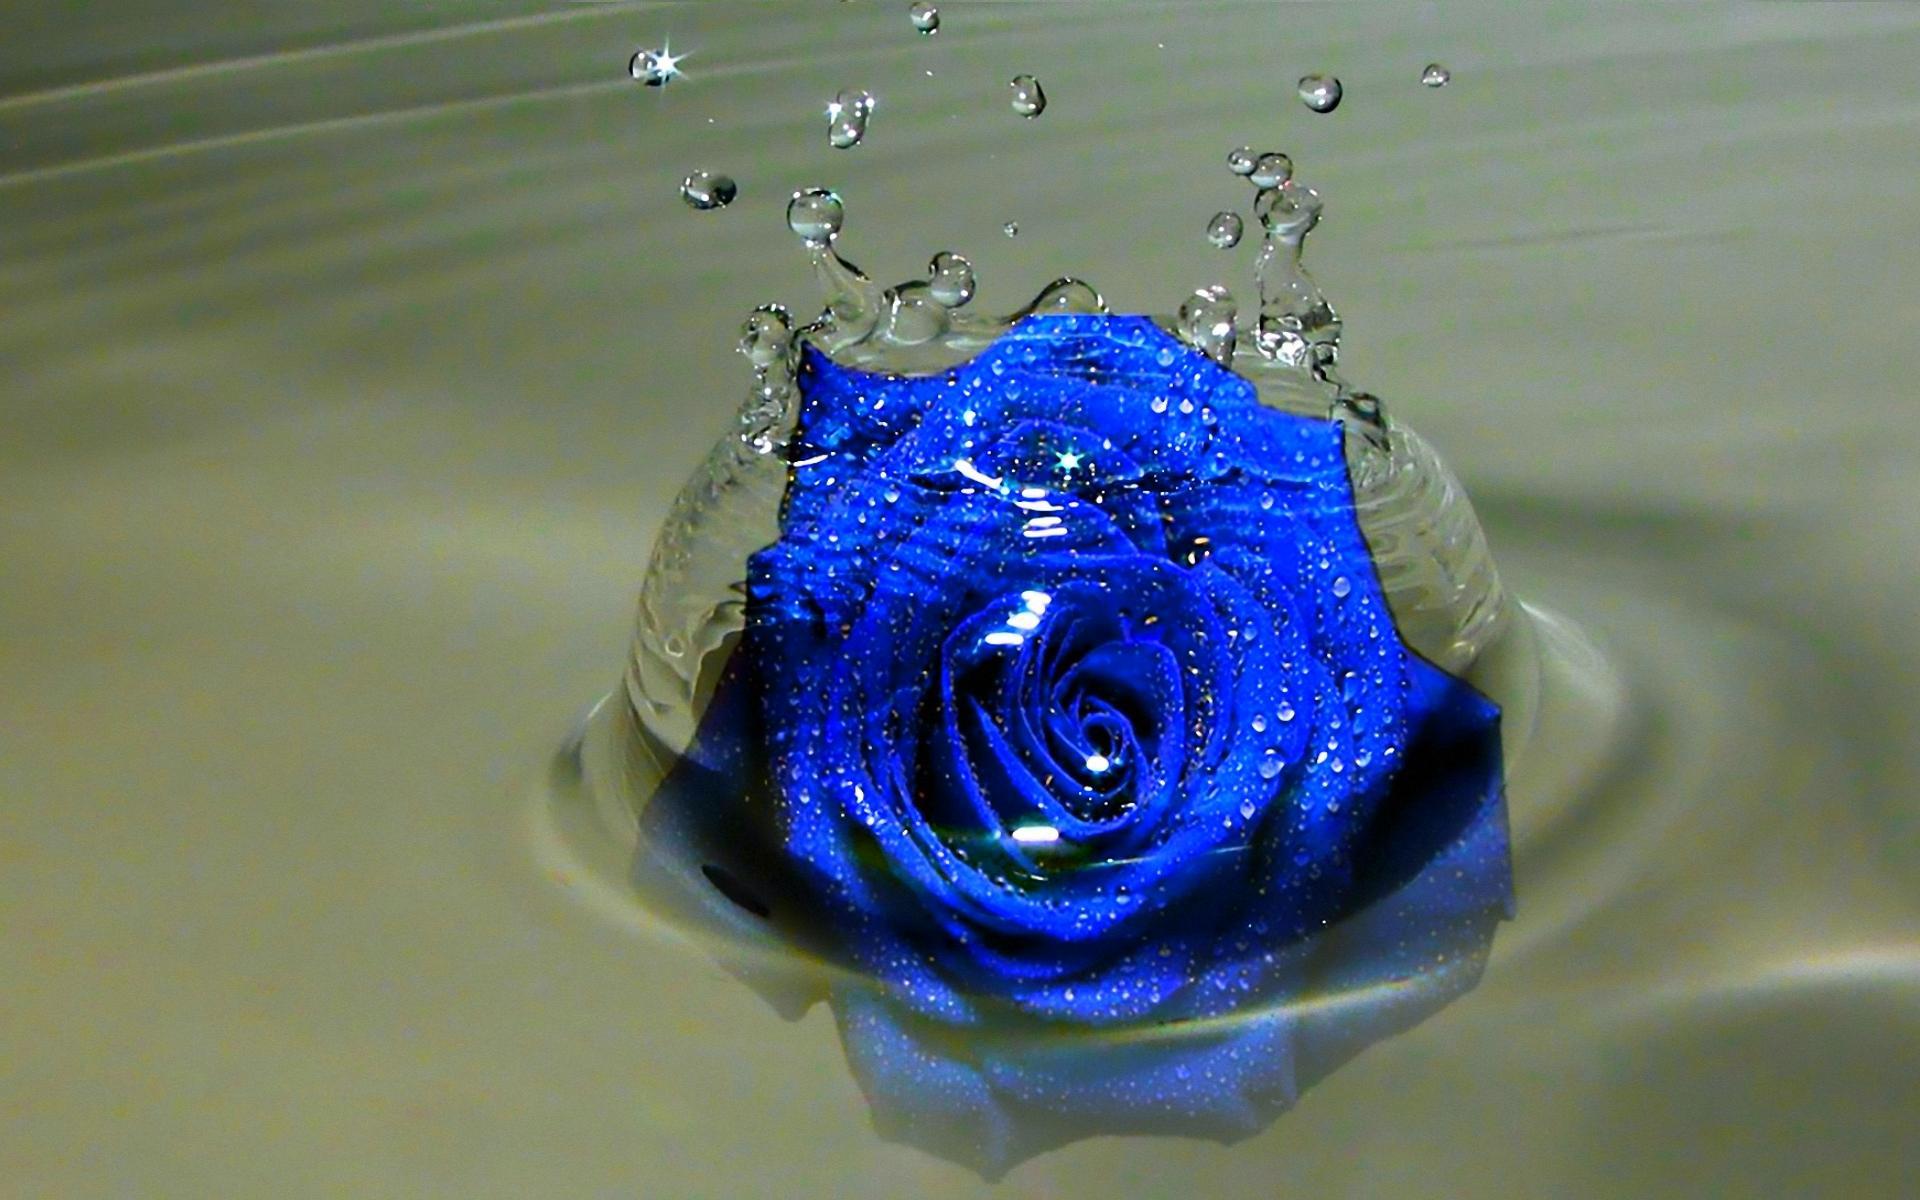 Broken Heart Quotes Wallpapers For Mobile Blue Rose Wallpaper Hd Pixelstalk Net